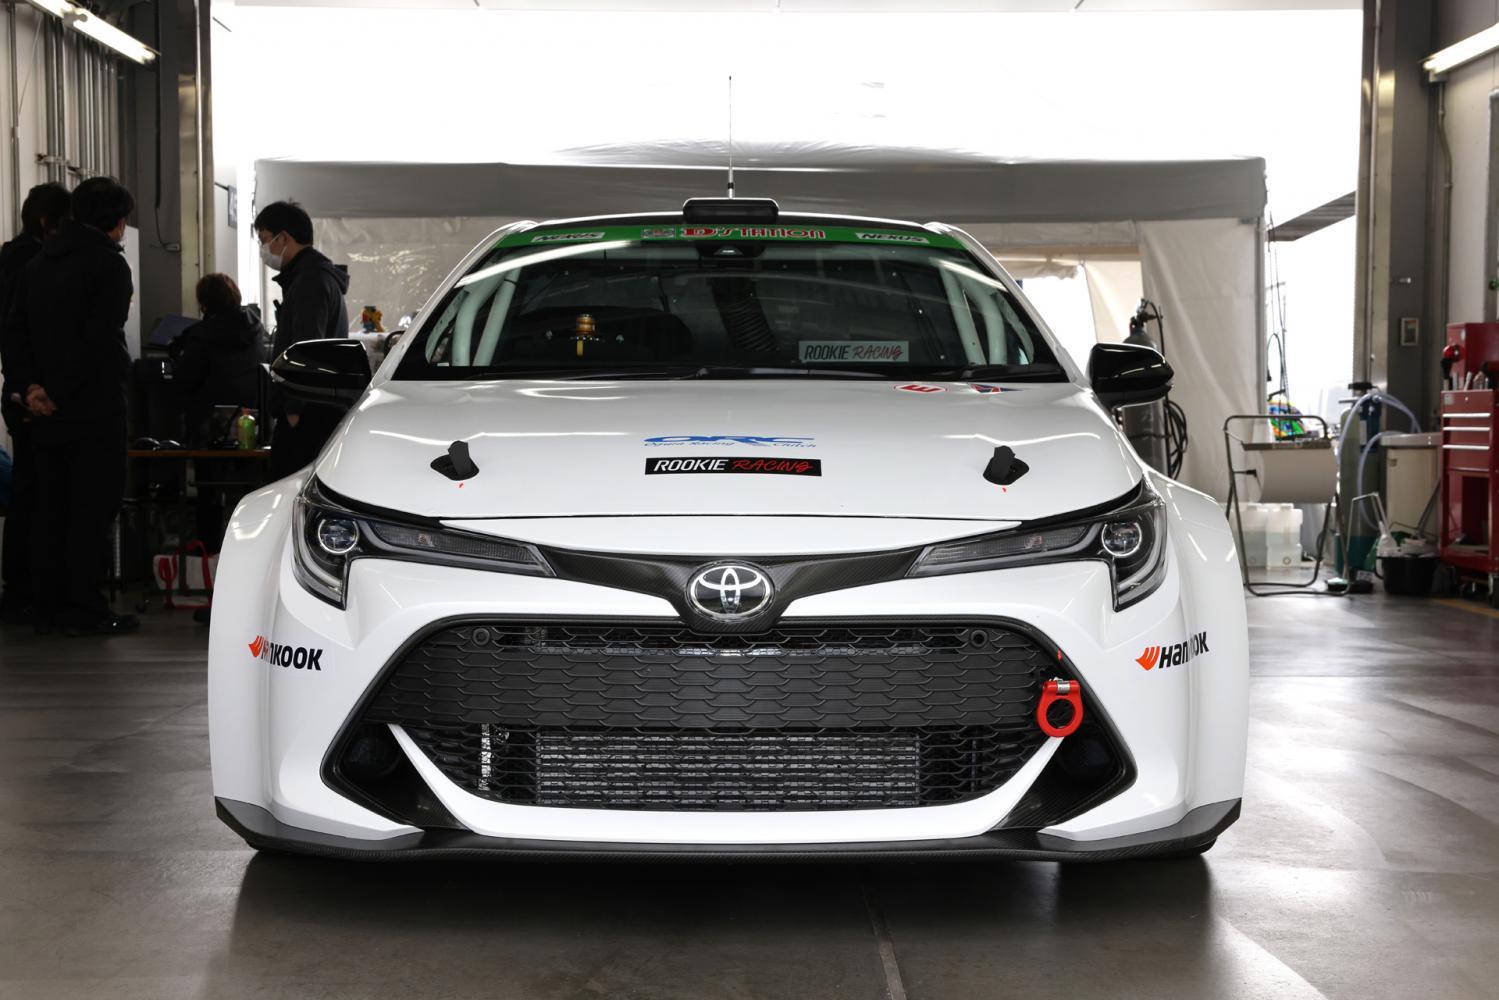 Toyota Accelerating Development of Hydrogen Engine Technologies Through Motorsports